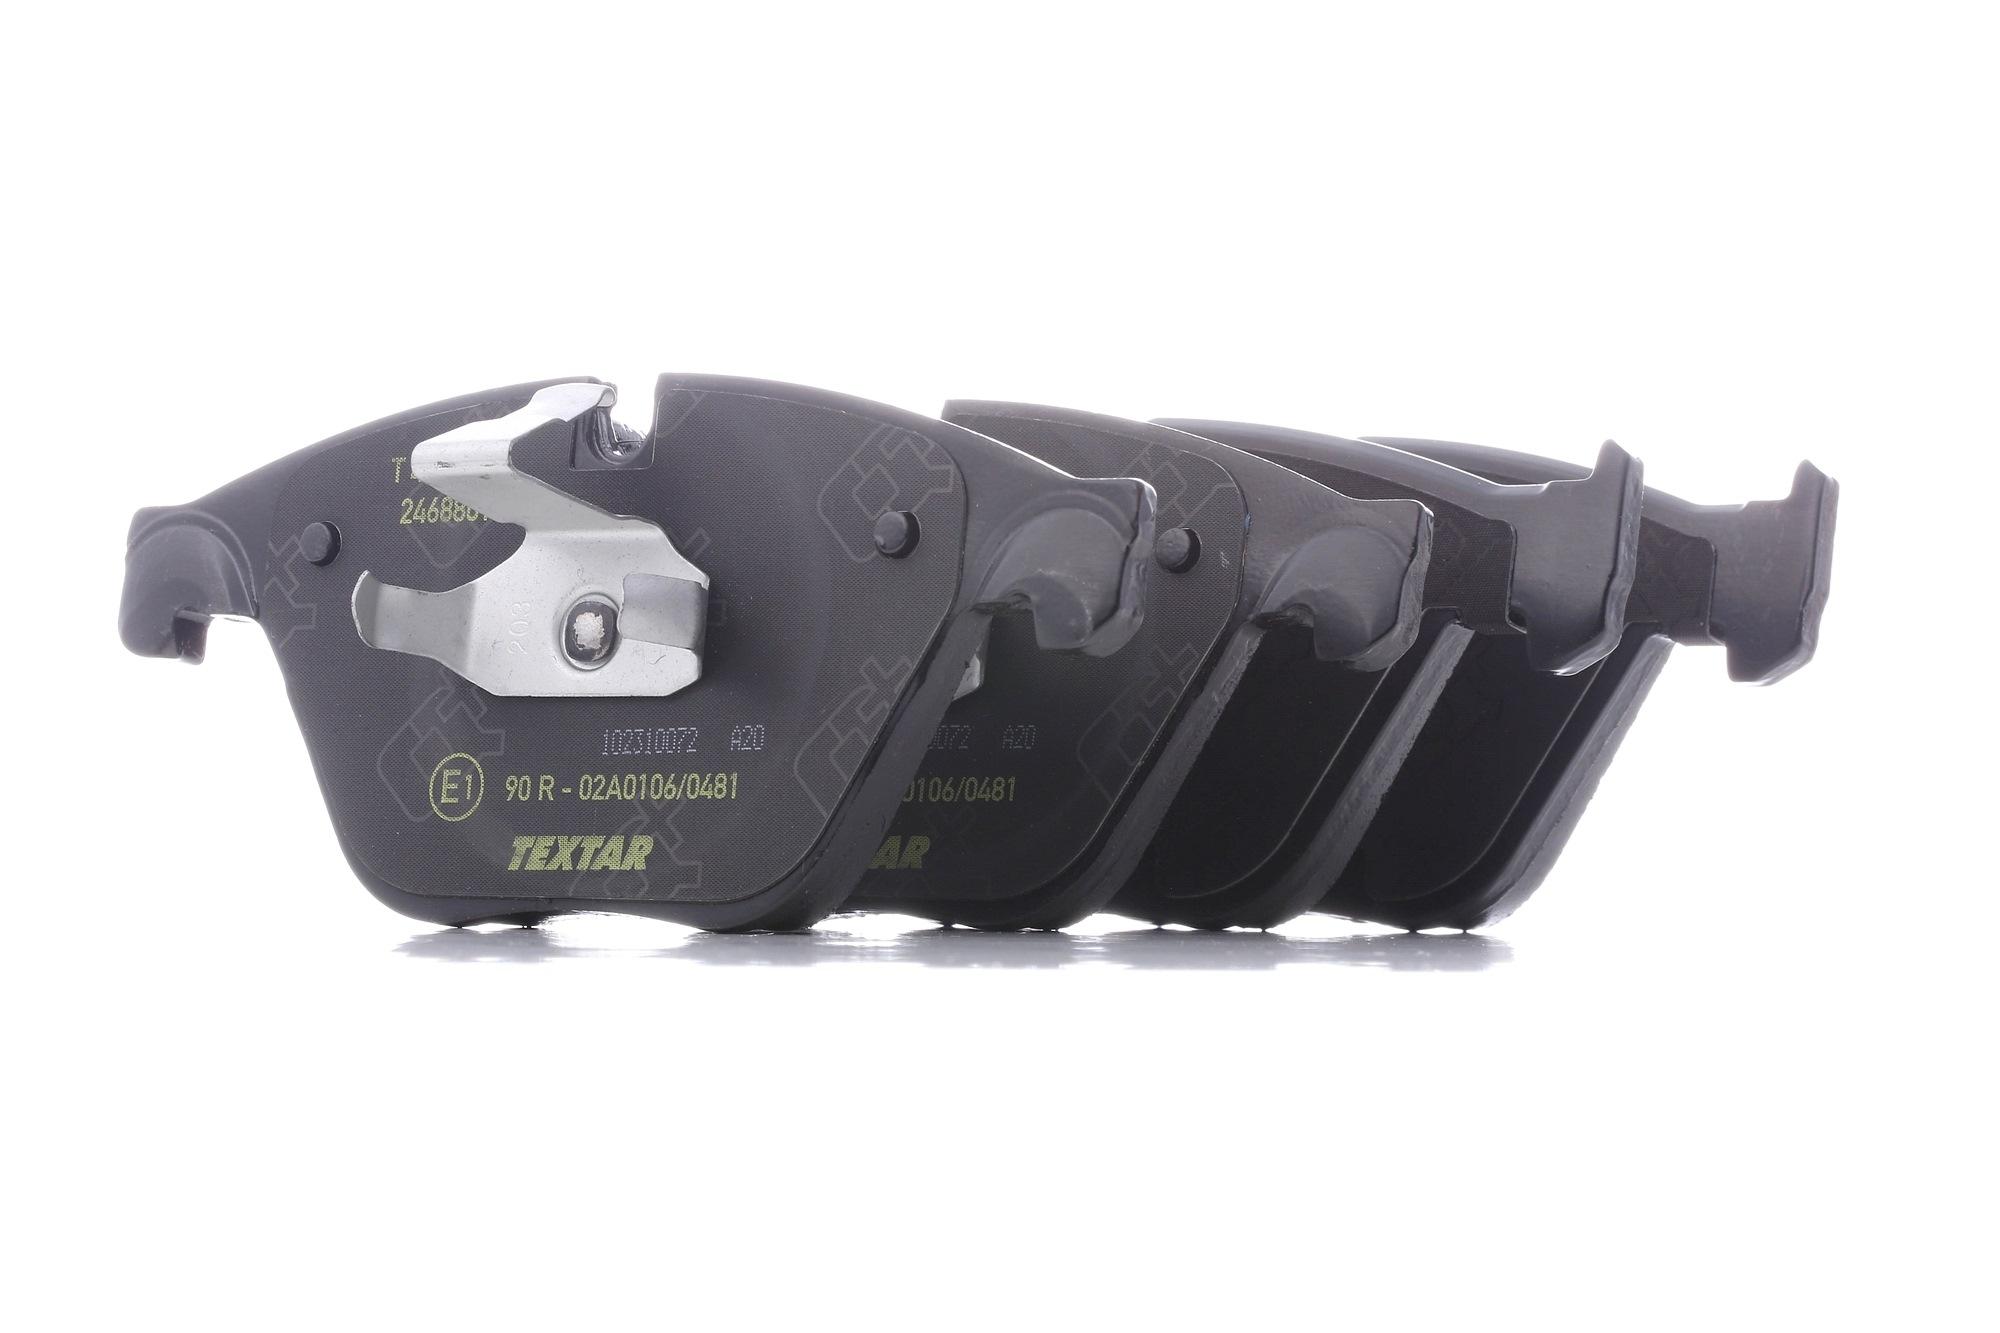 Bremsbelagsatz TEXTAR 2468819205 Bewertung